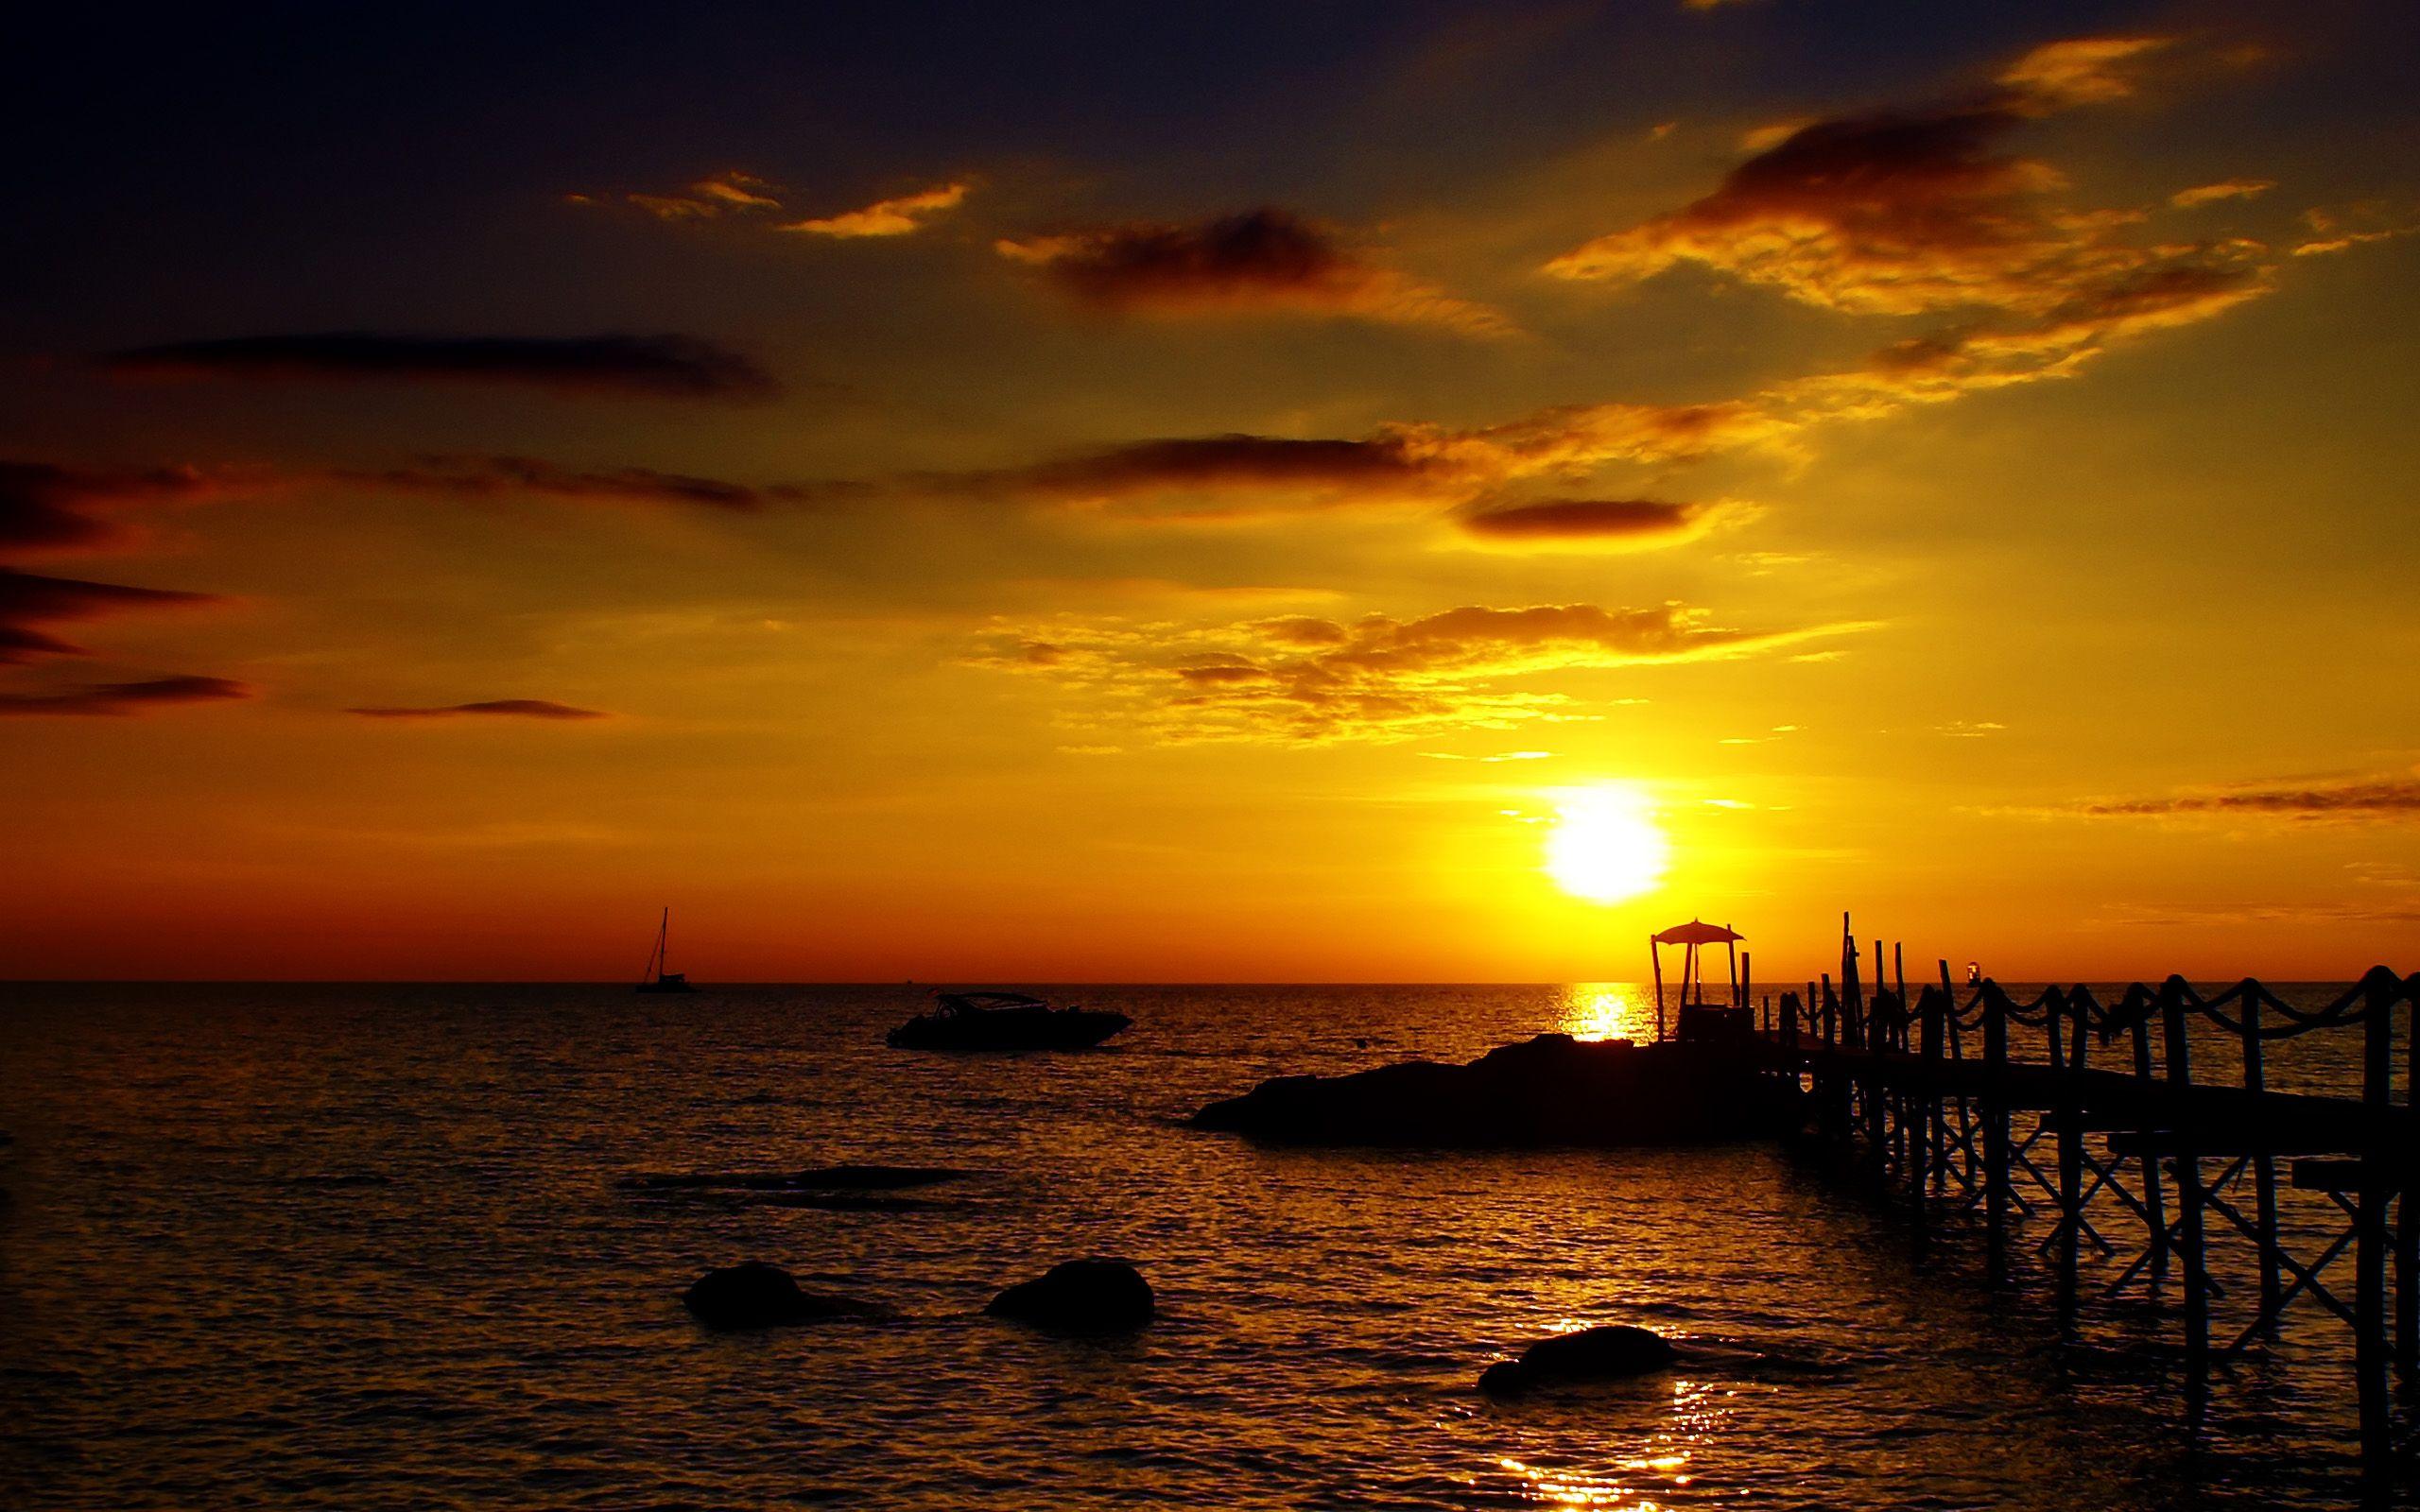 pin golden sunset hd - photo #5